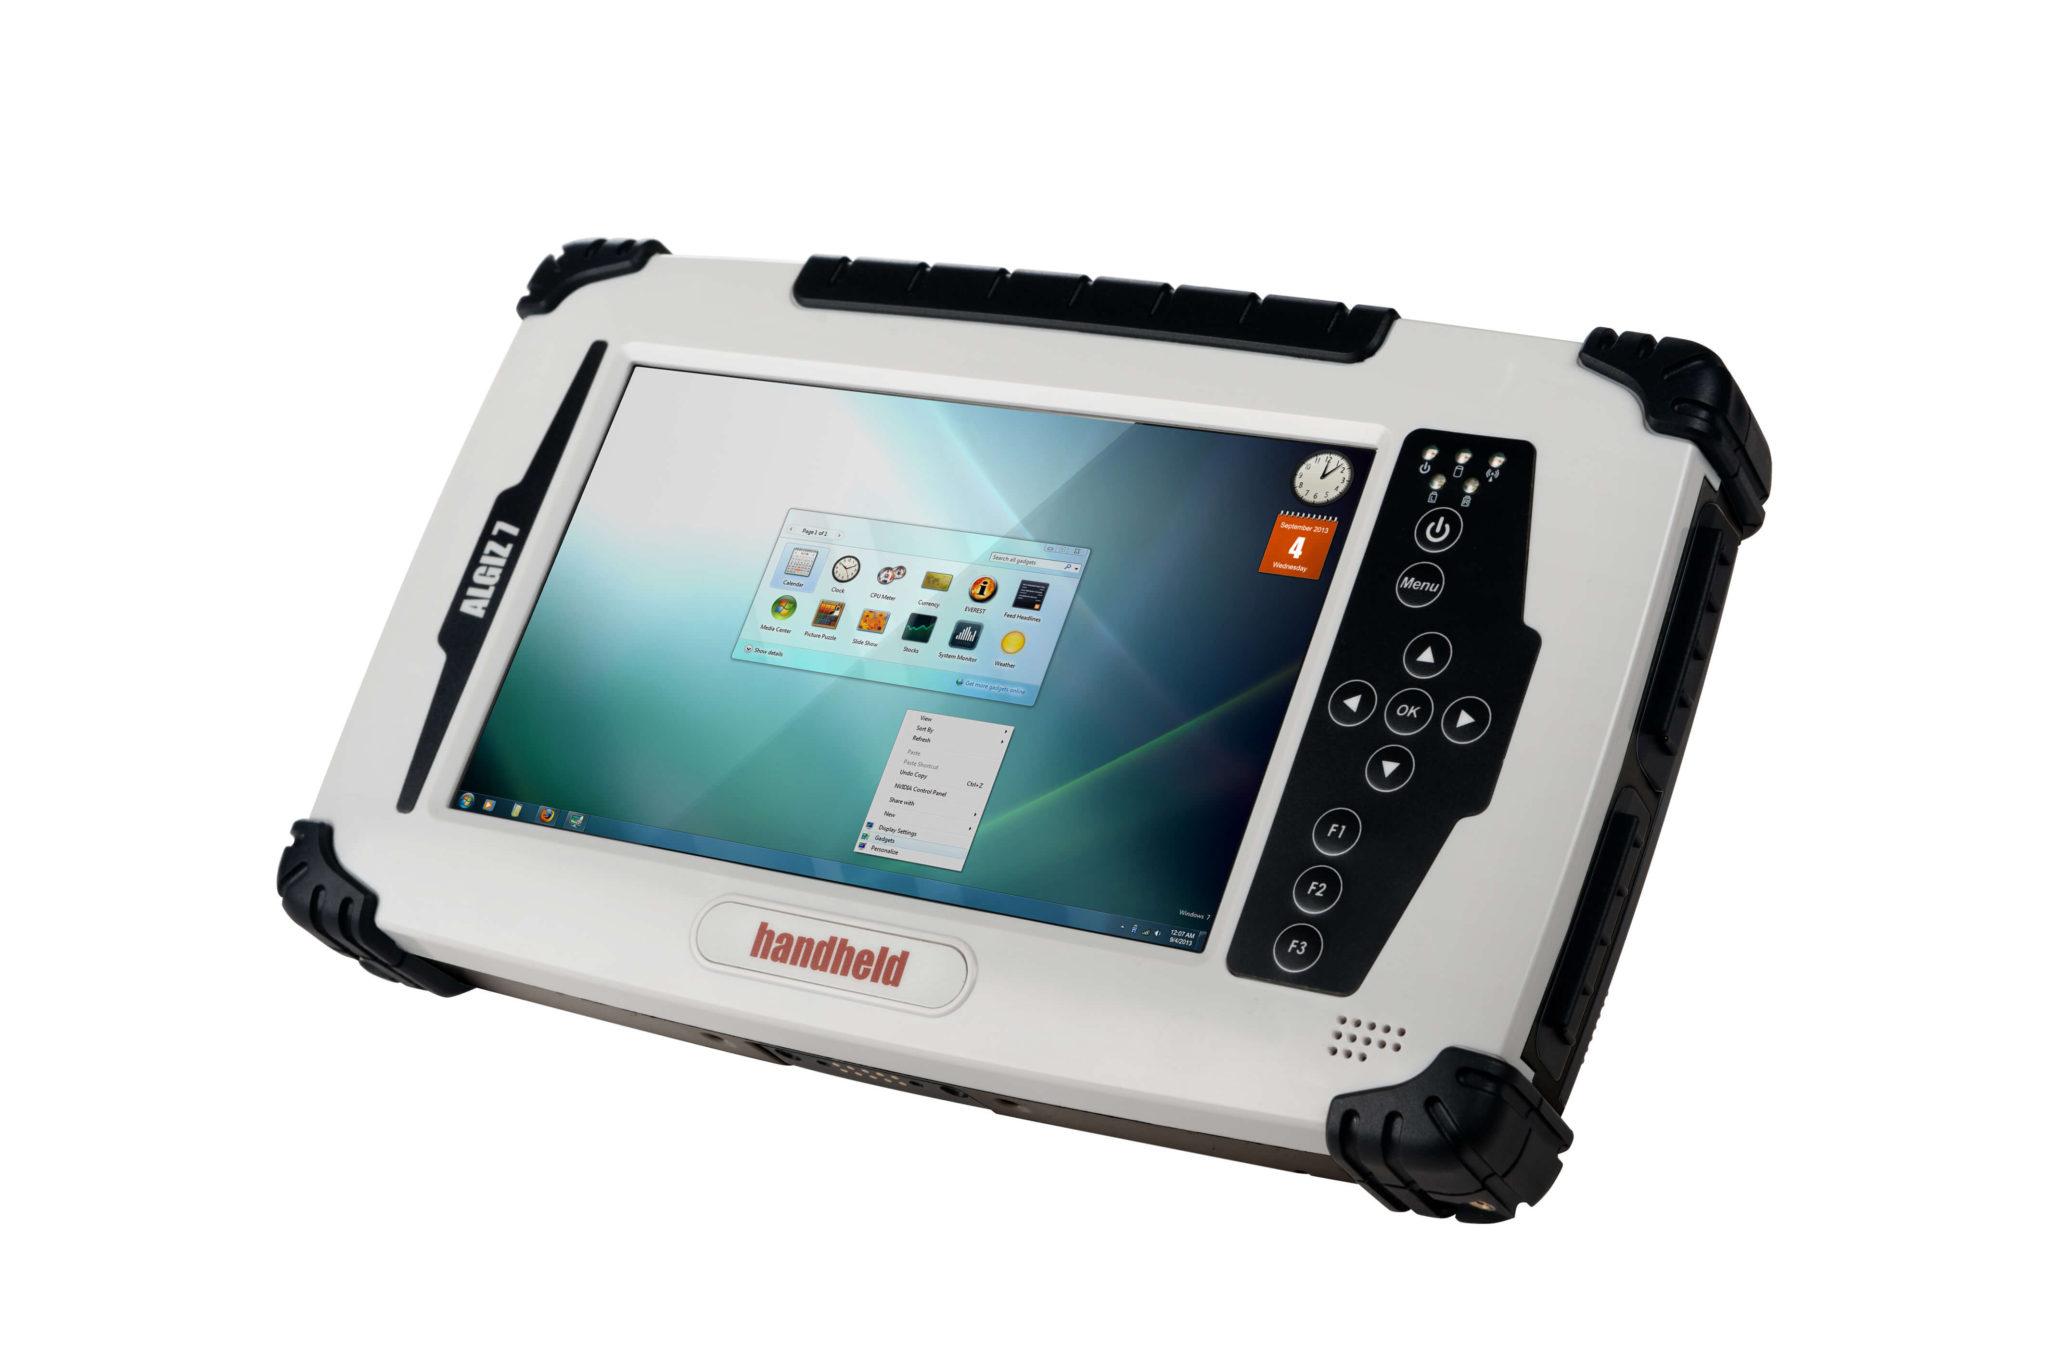 algiz-7-handheld-tablet-facing-left-new